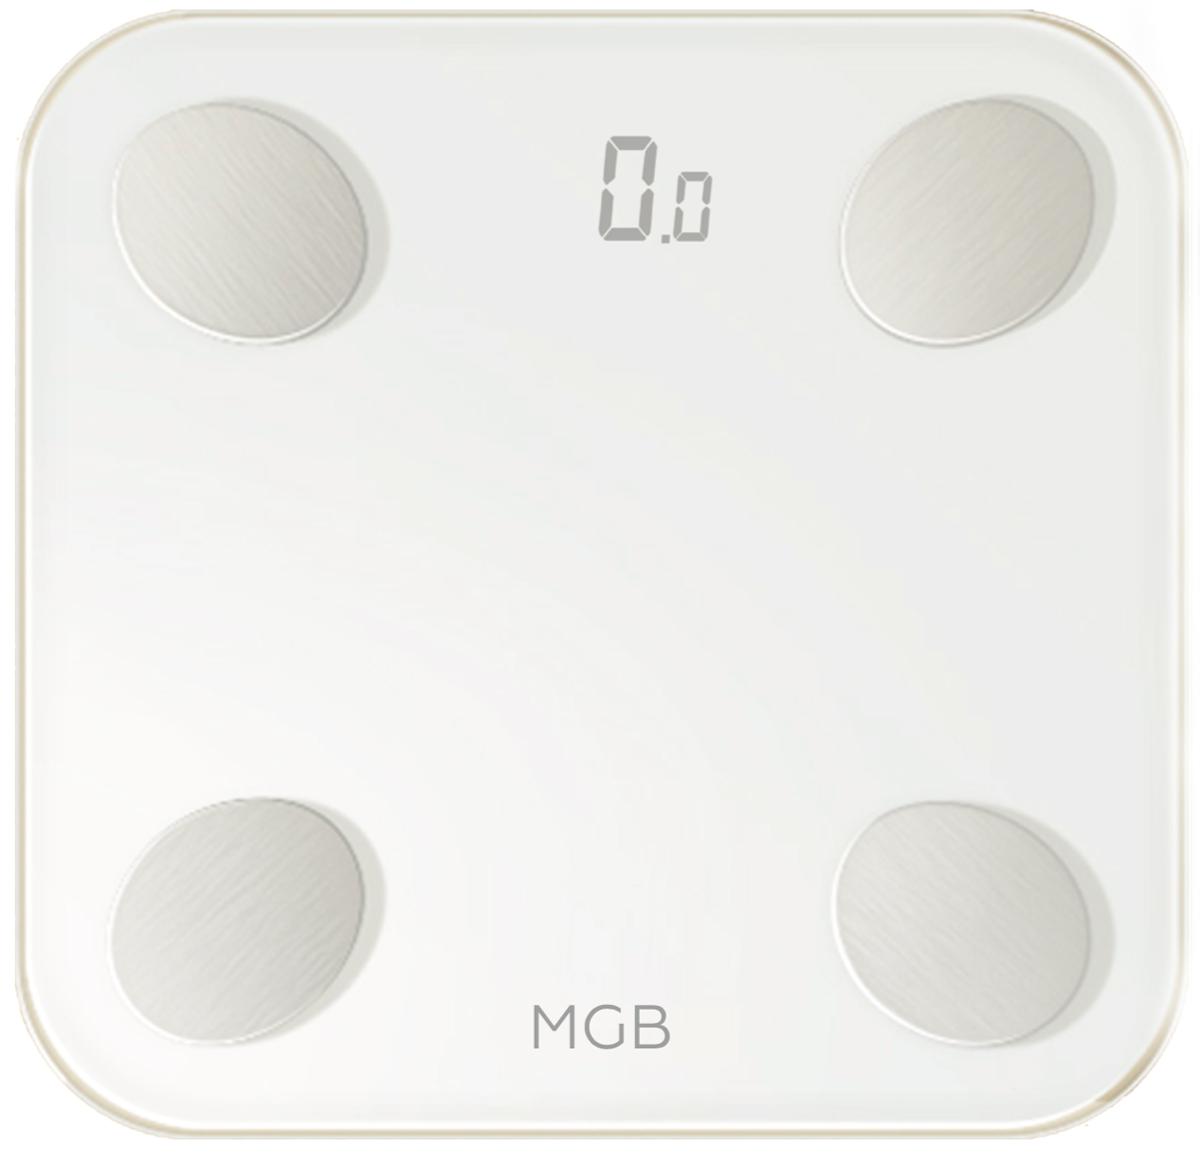 "Умные весы MGB ""Body Fat Scale Glass Edition"", цвет: белый"